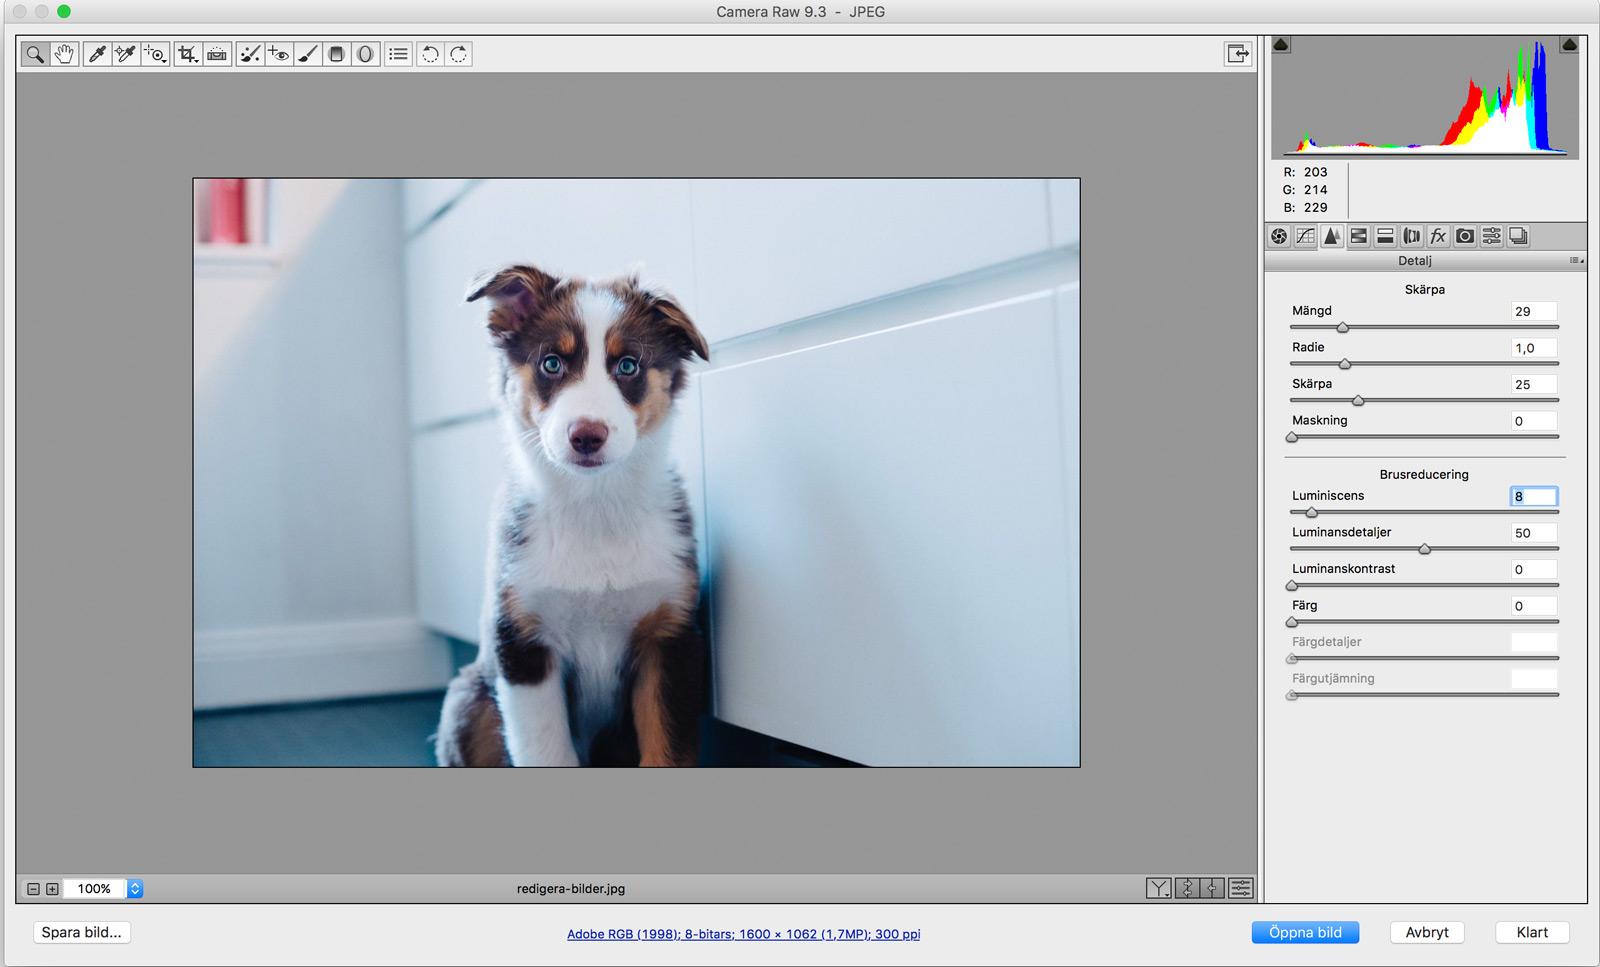 redigera-bilder-i-camera-raw-2